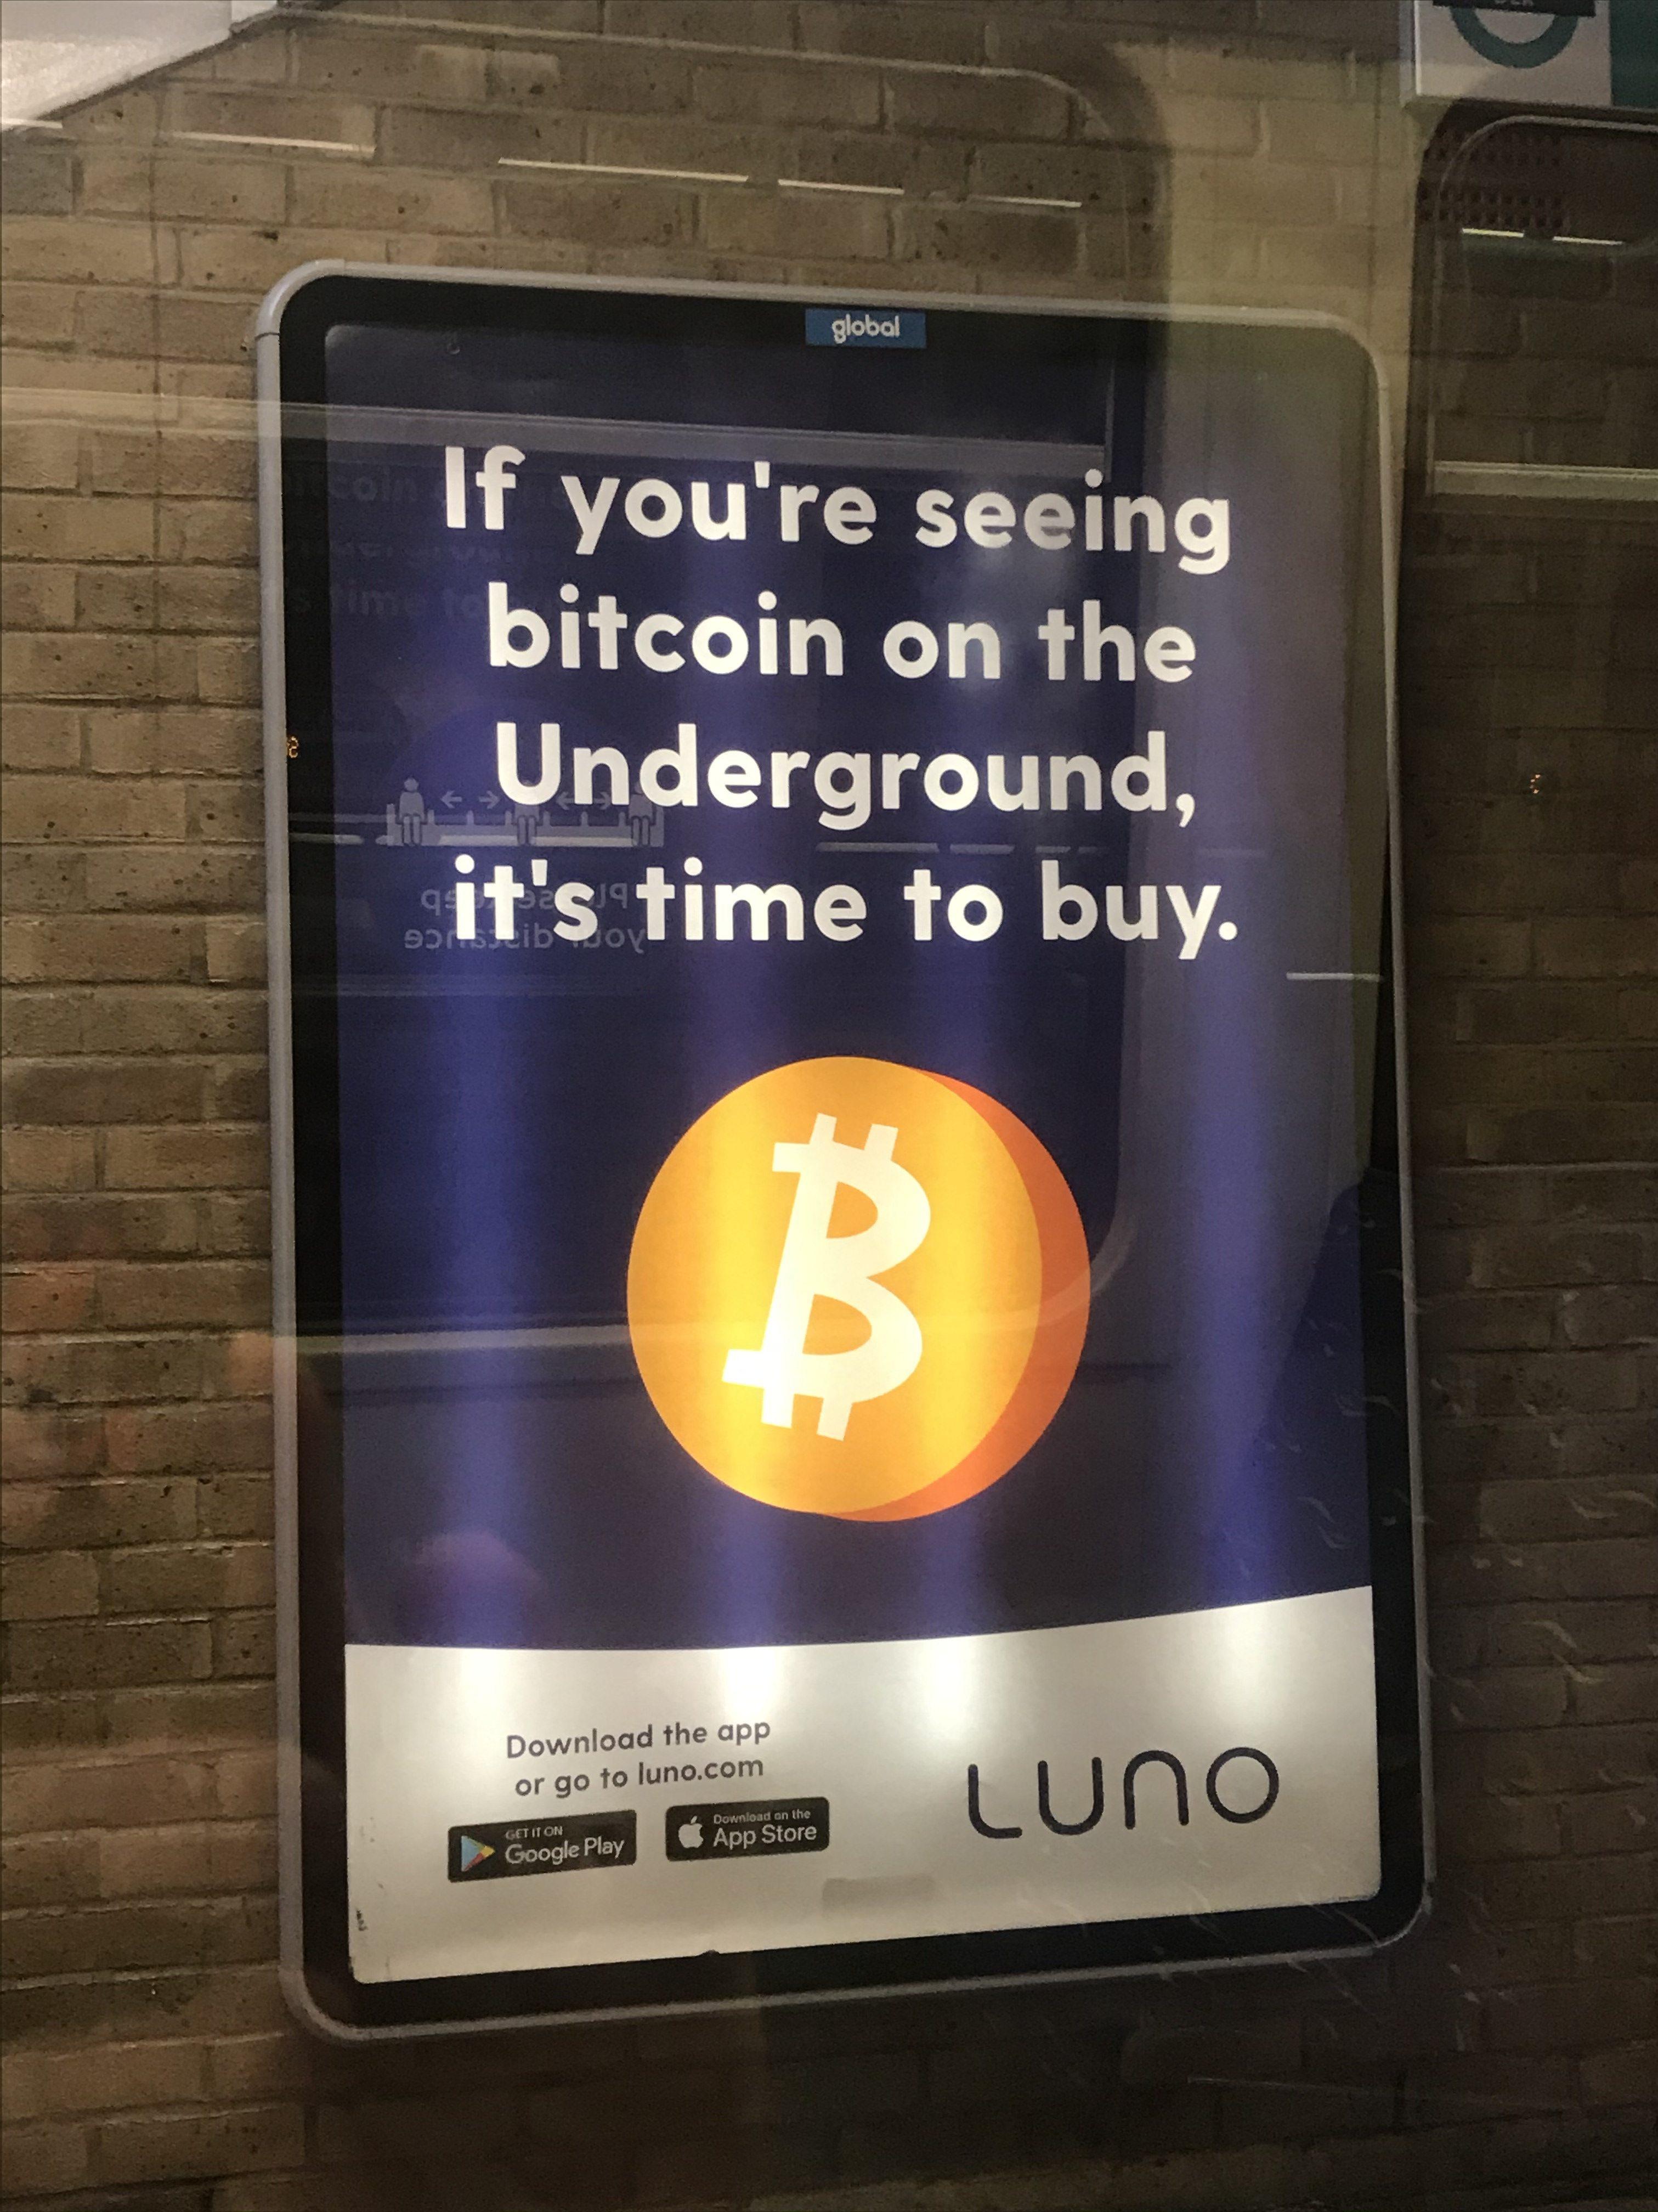 Bit Coin Tube Ad